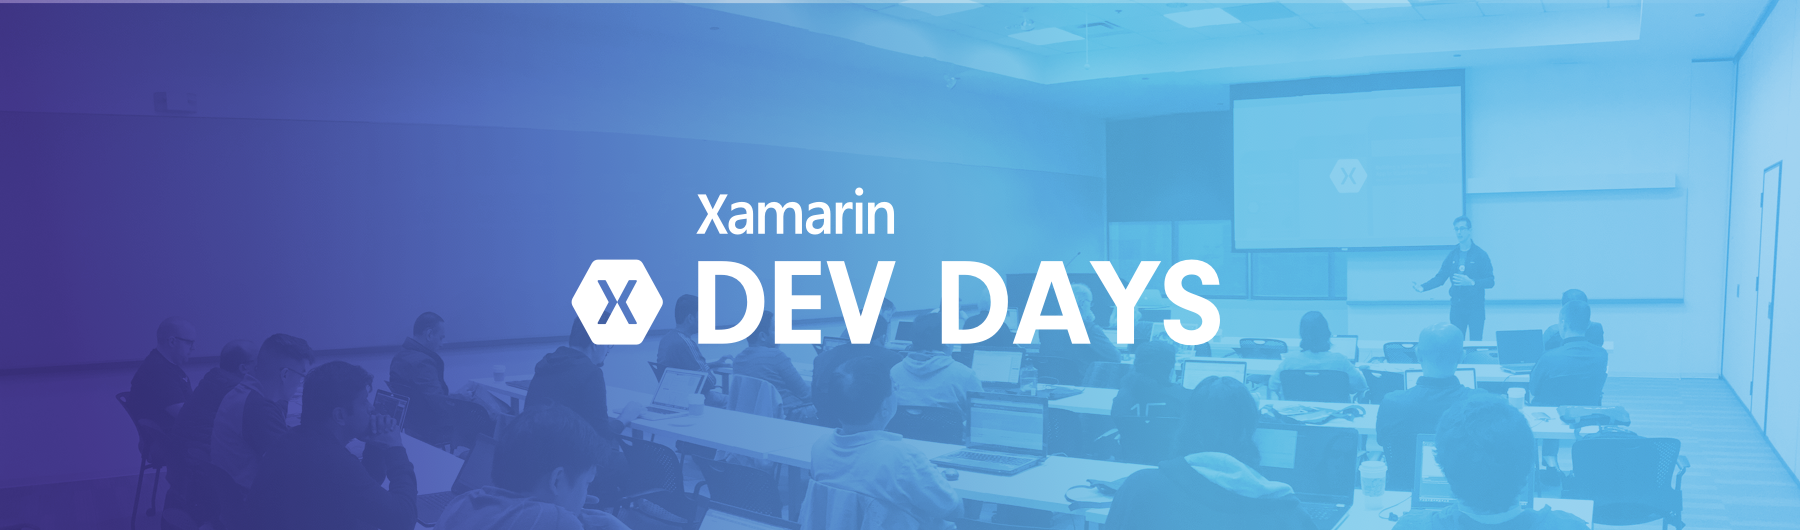 Xamarin Dev Days - Ivano-Frankivsk